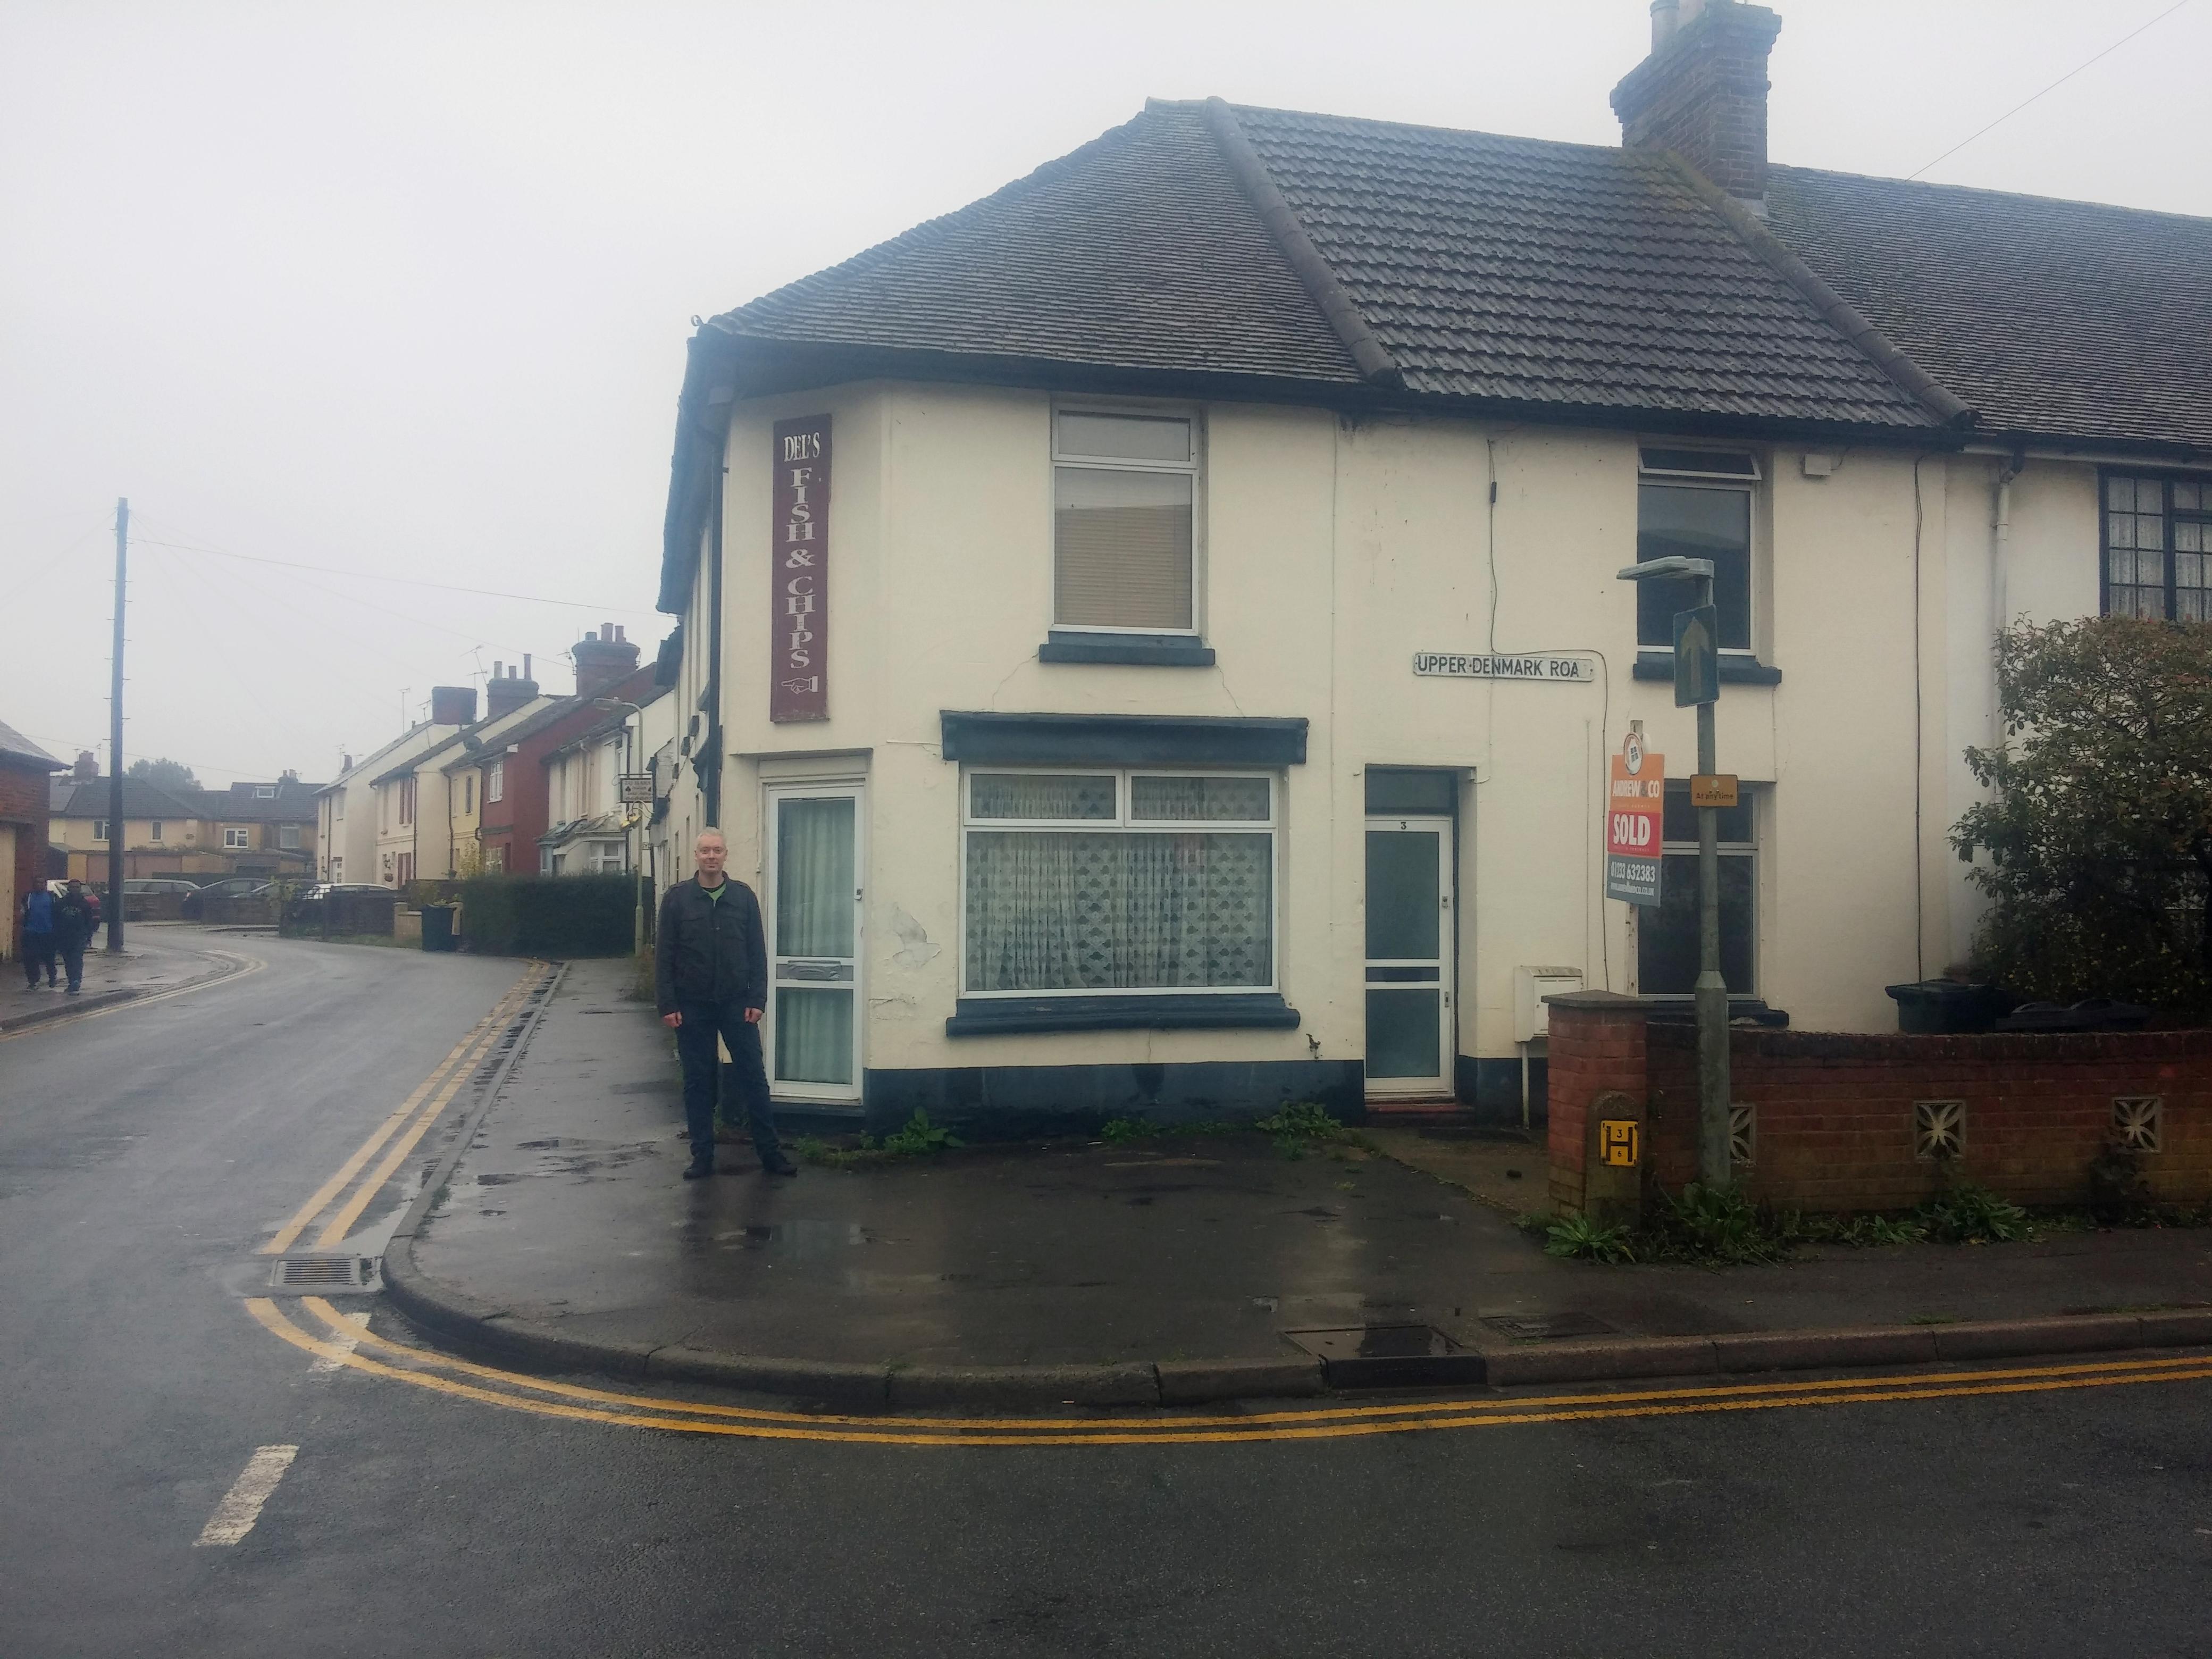 Upper Denmark Road, Ashford, UK